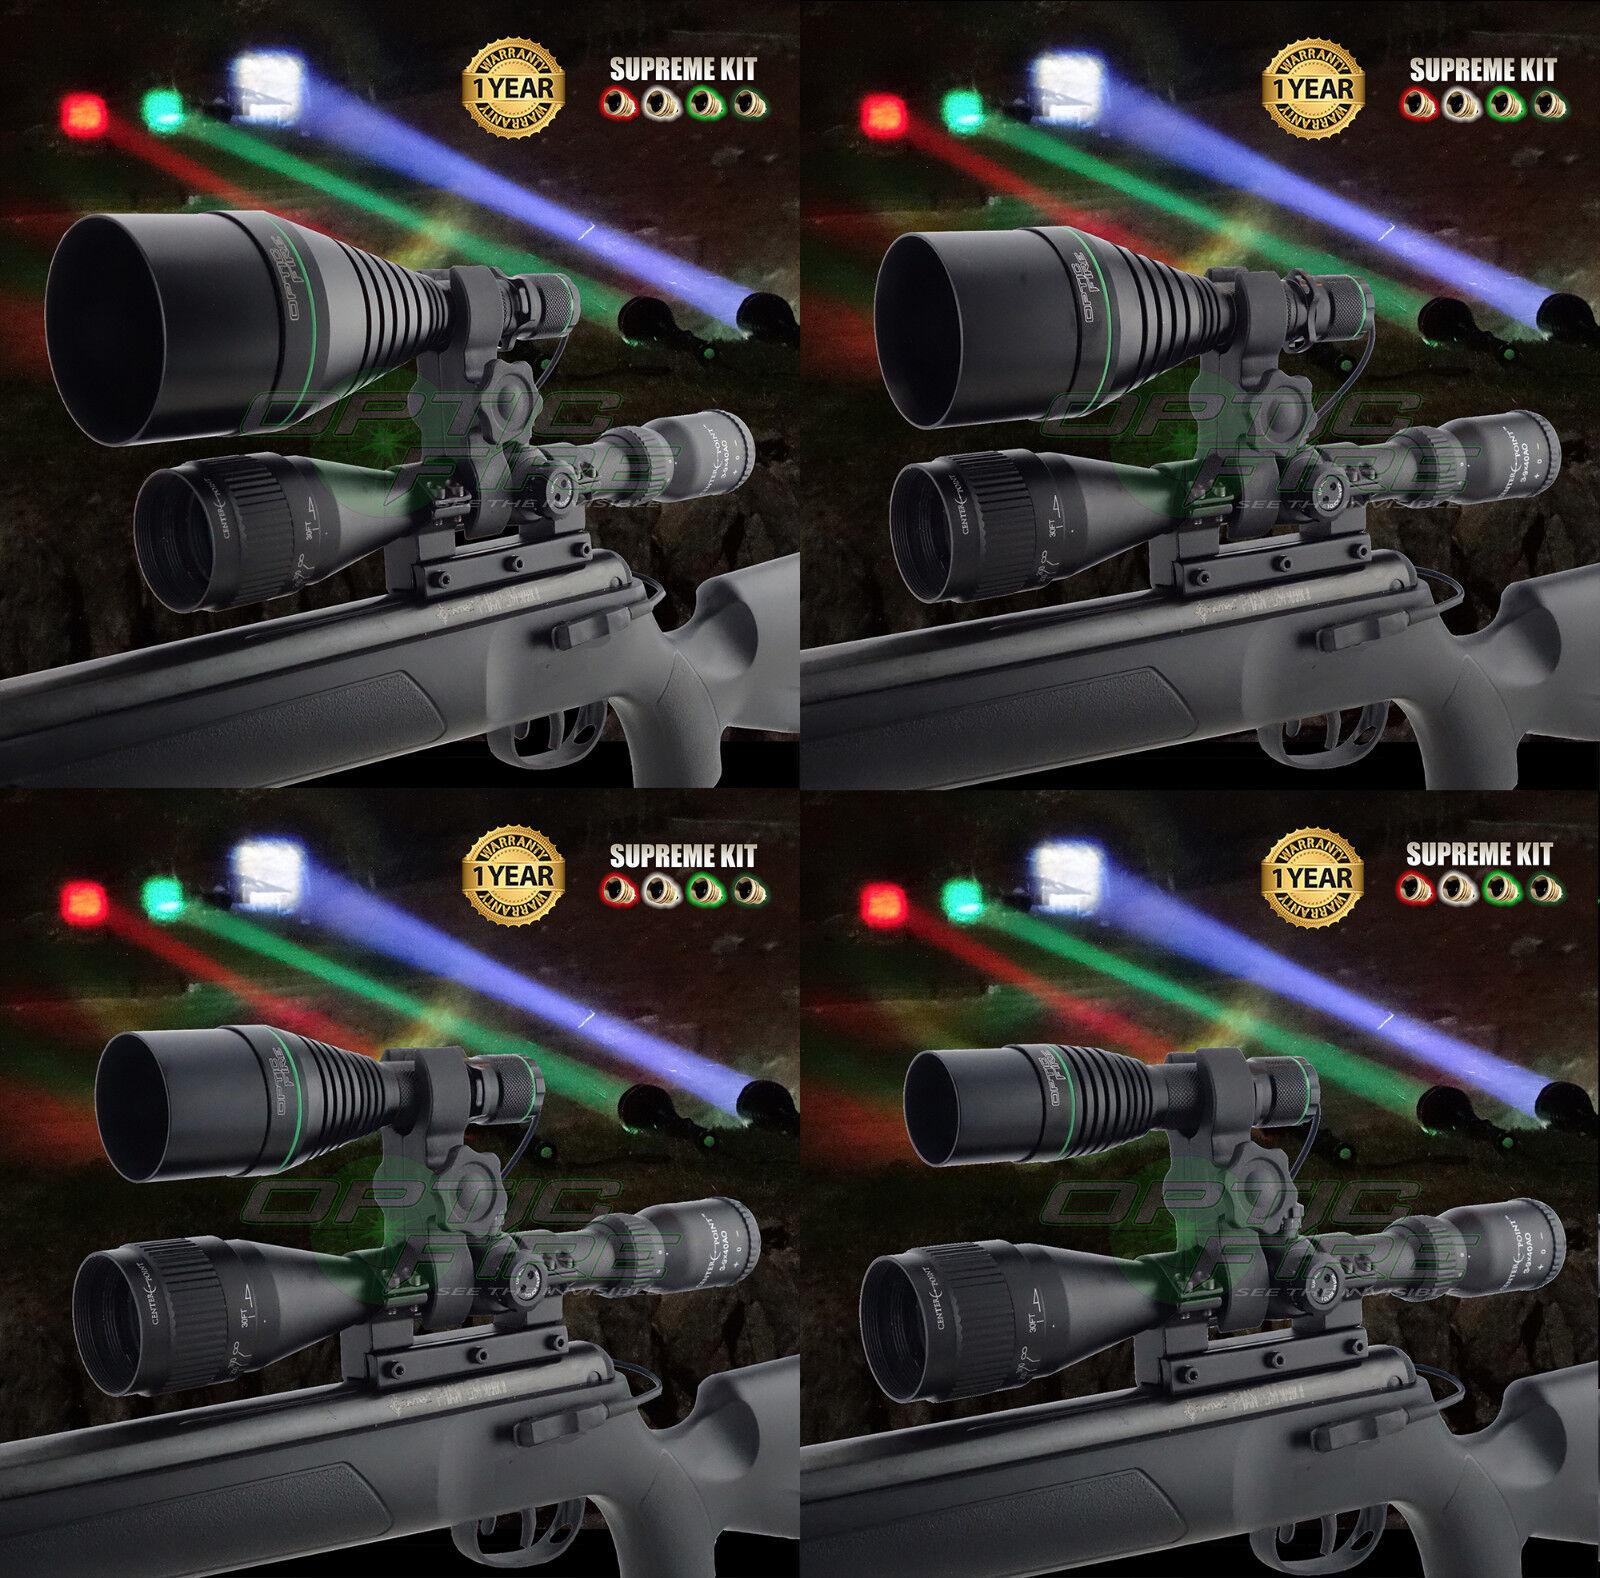 Opticfire ® XS 4 LED Luz de Montaje Alcance Pistola De Lámpara Antorcha Caza Lamping Kit Supremo